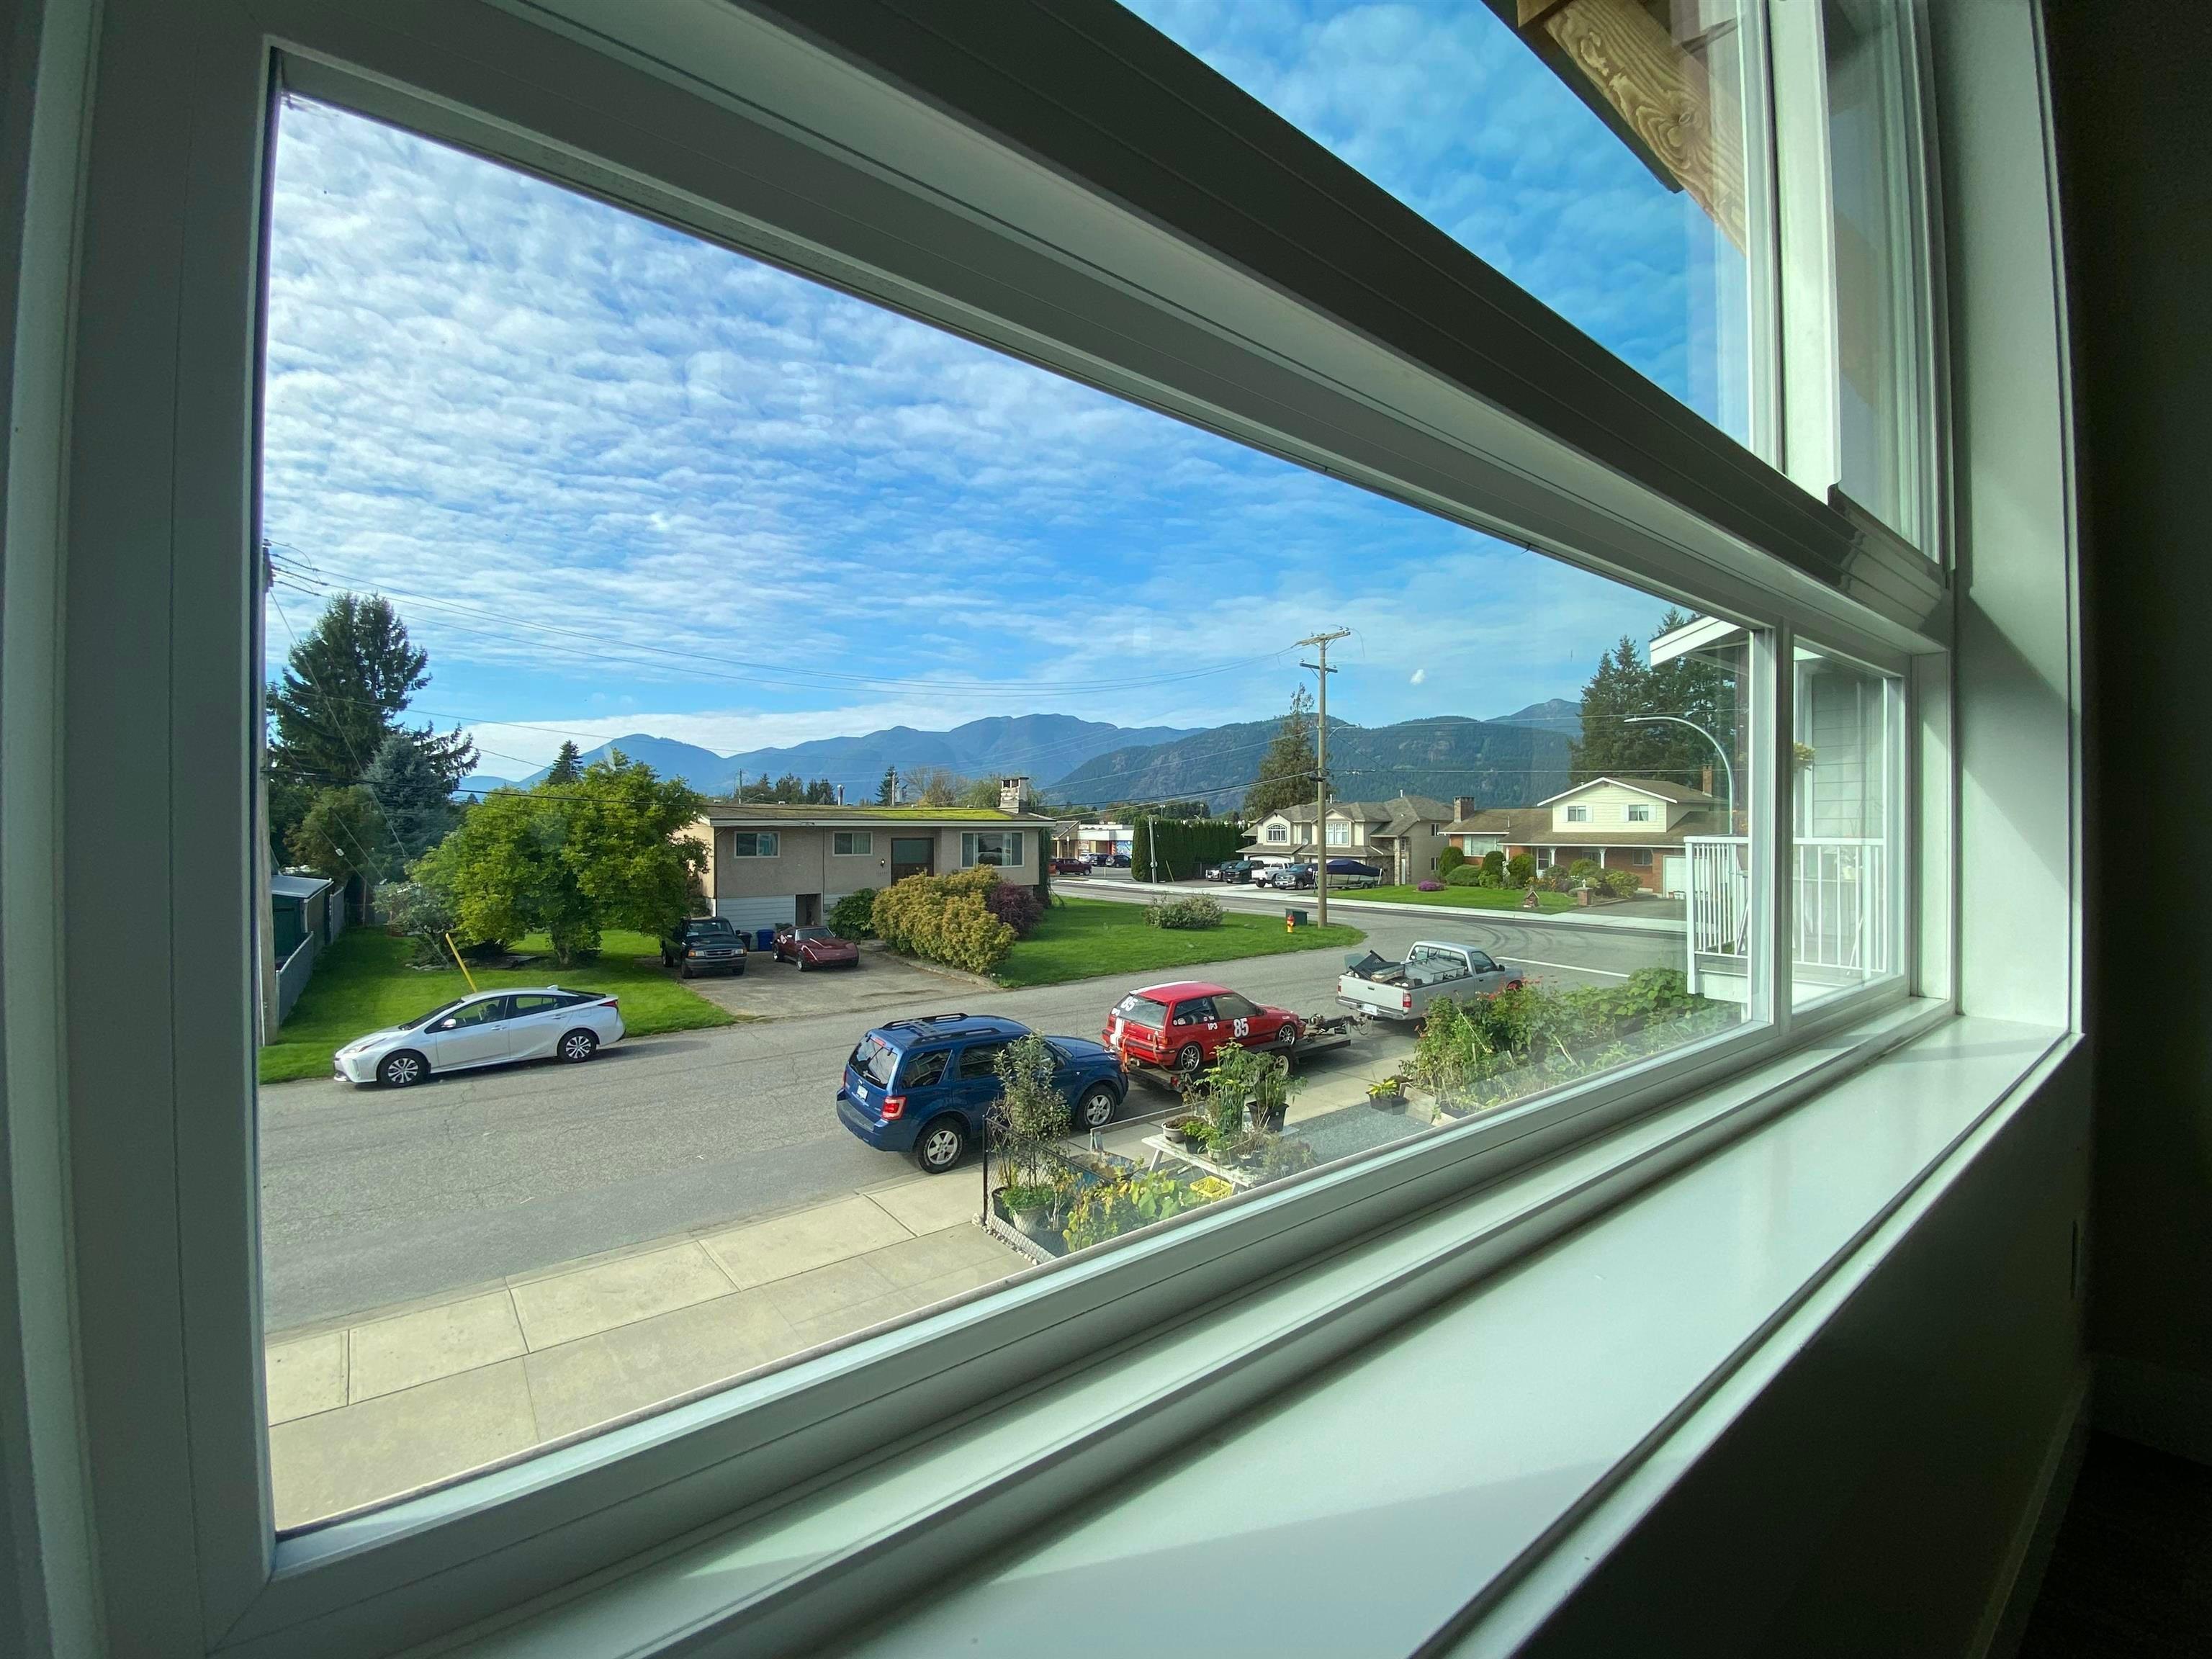 10144 KILLARNEY DRIVE - Fairfield Island House/Single Family for sale, 5 Bedrooms (R2625716) - #22